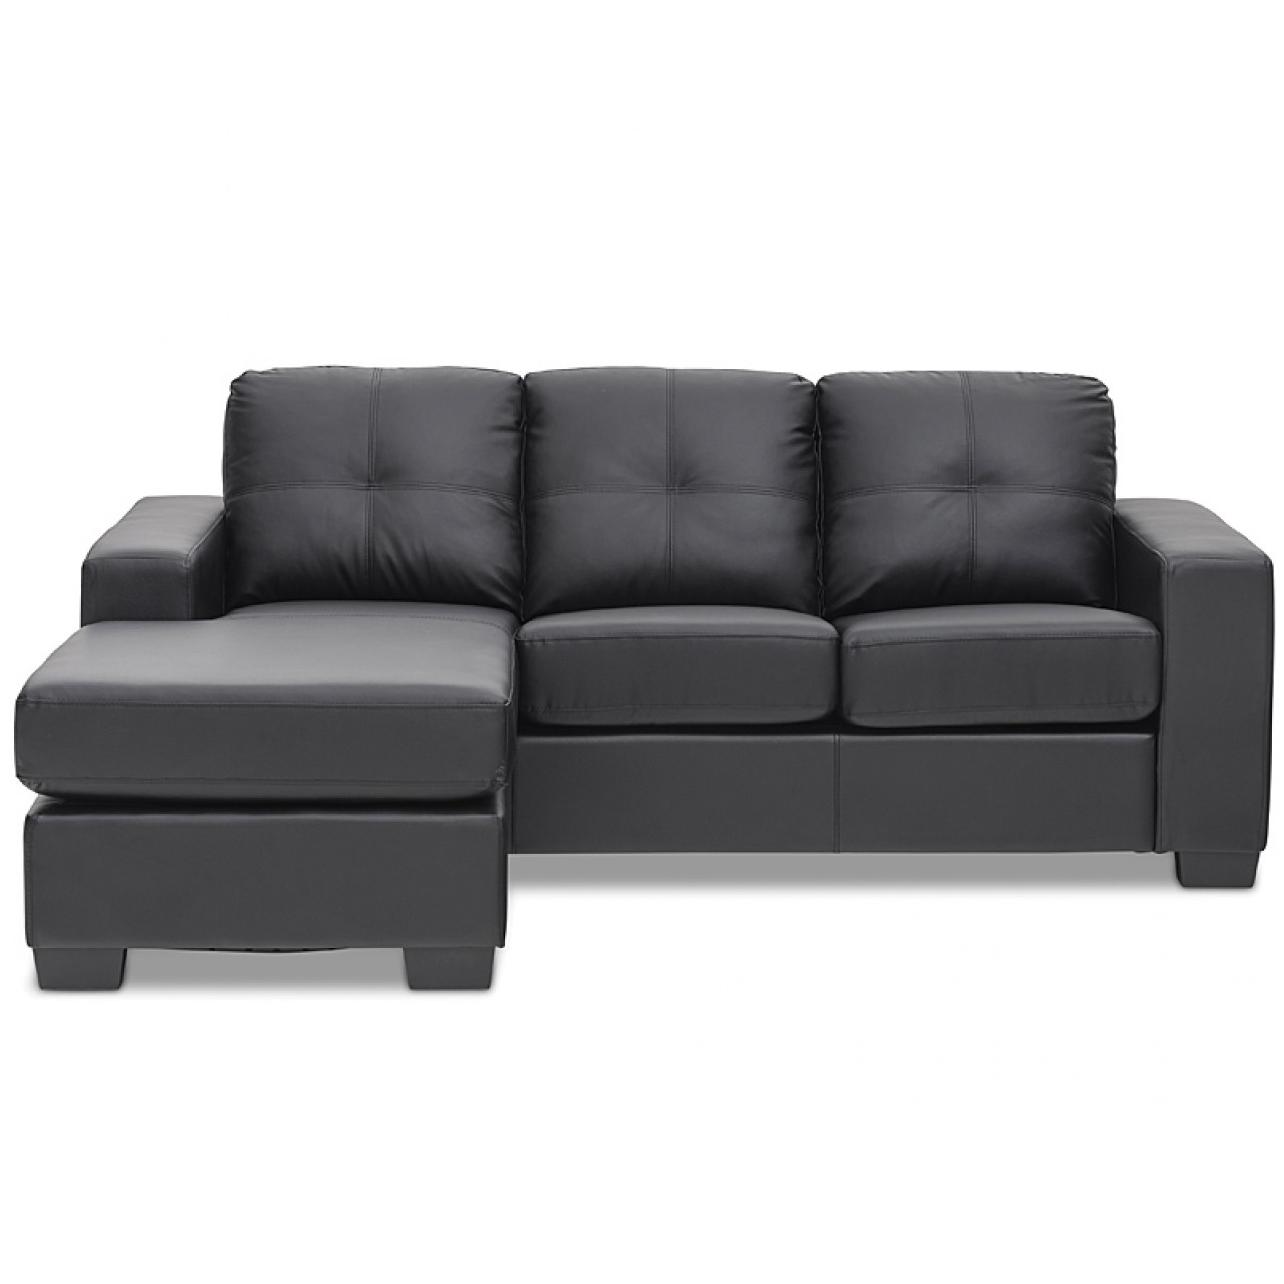 Leather Lounge - $220.00